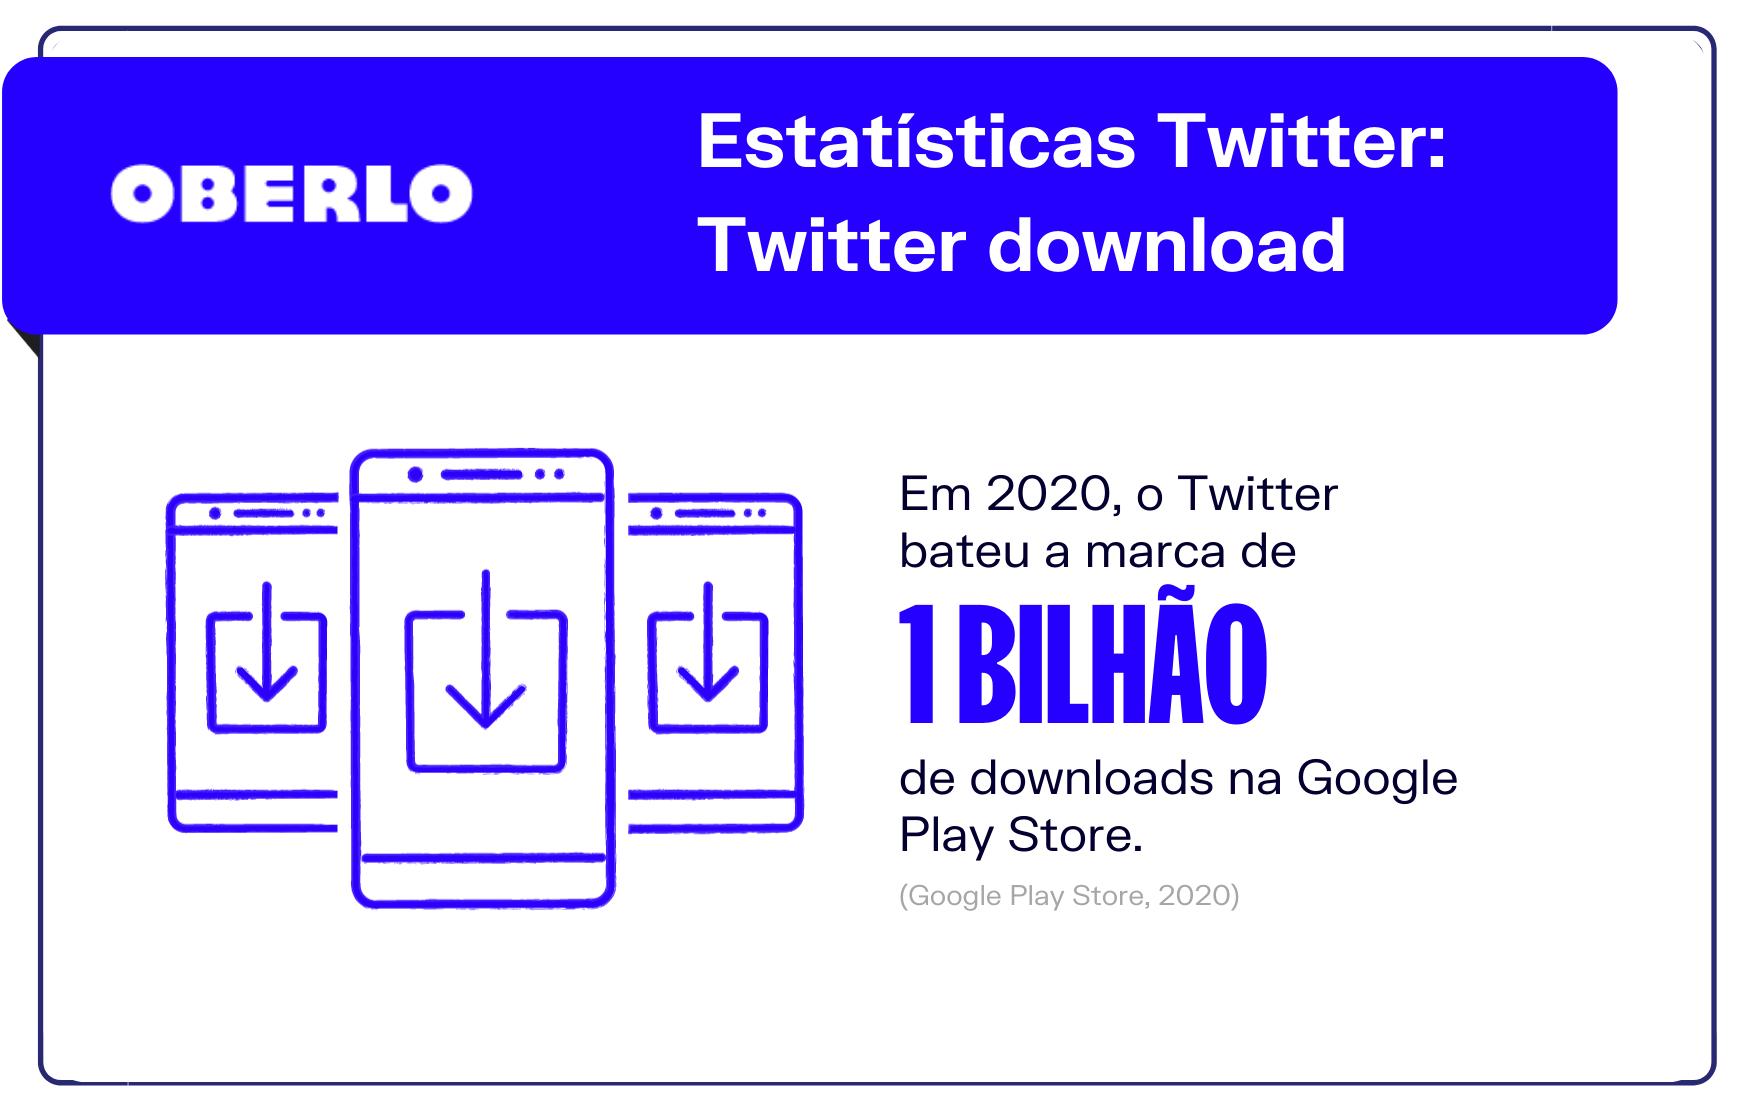 Estatísticas Twitter: Twitter download